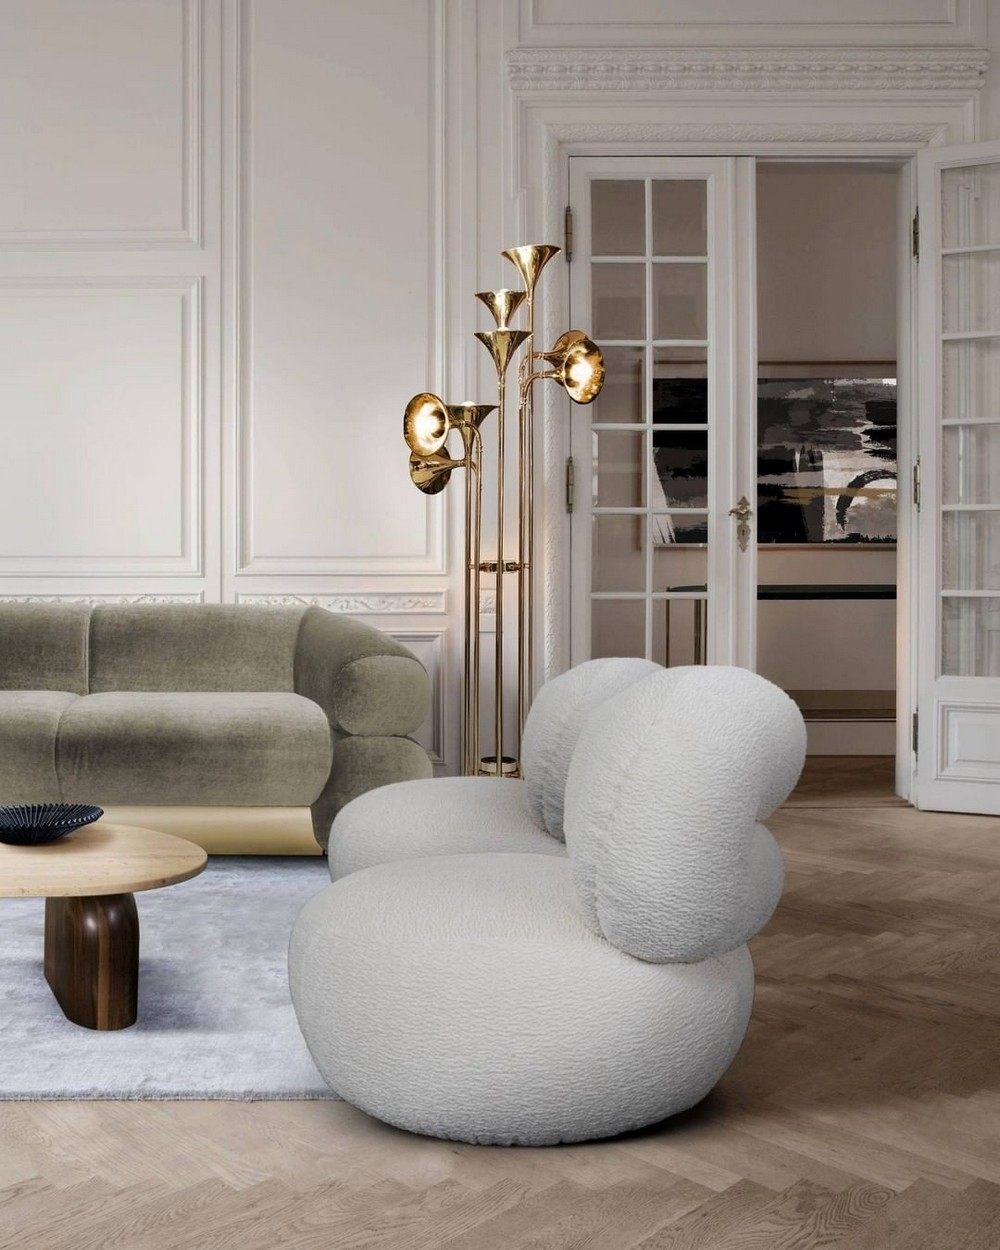 living room ideas 18 Living Room Ideas And Essentials – PART III 13 1